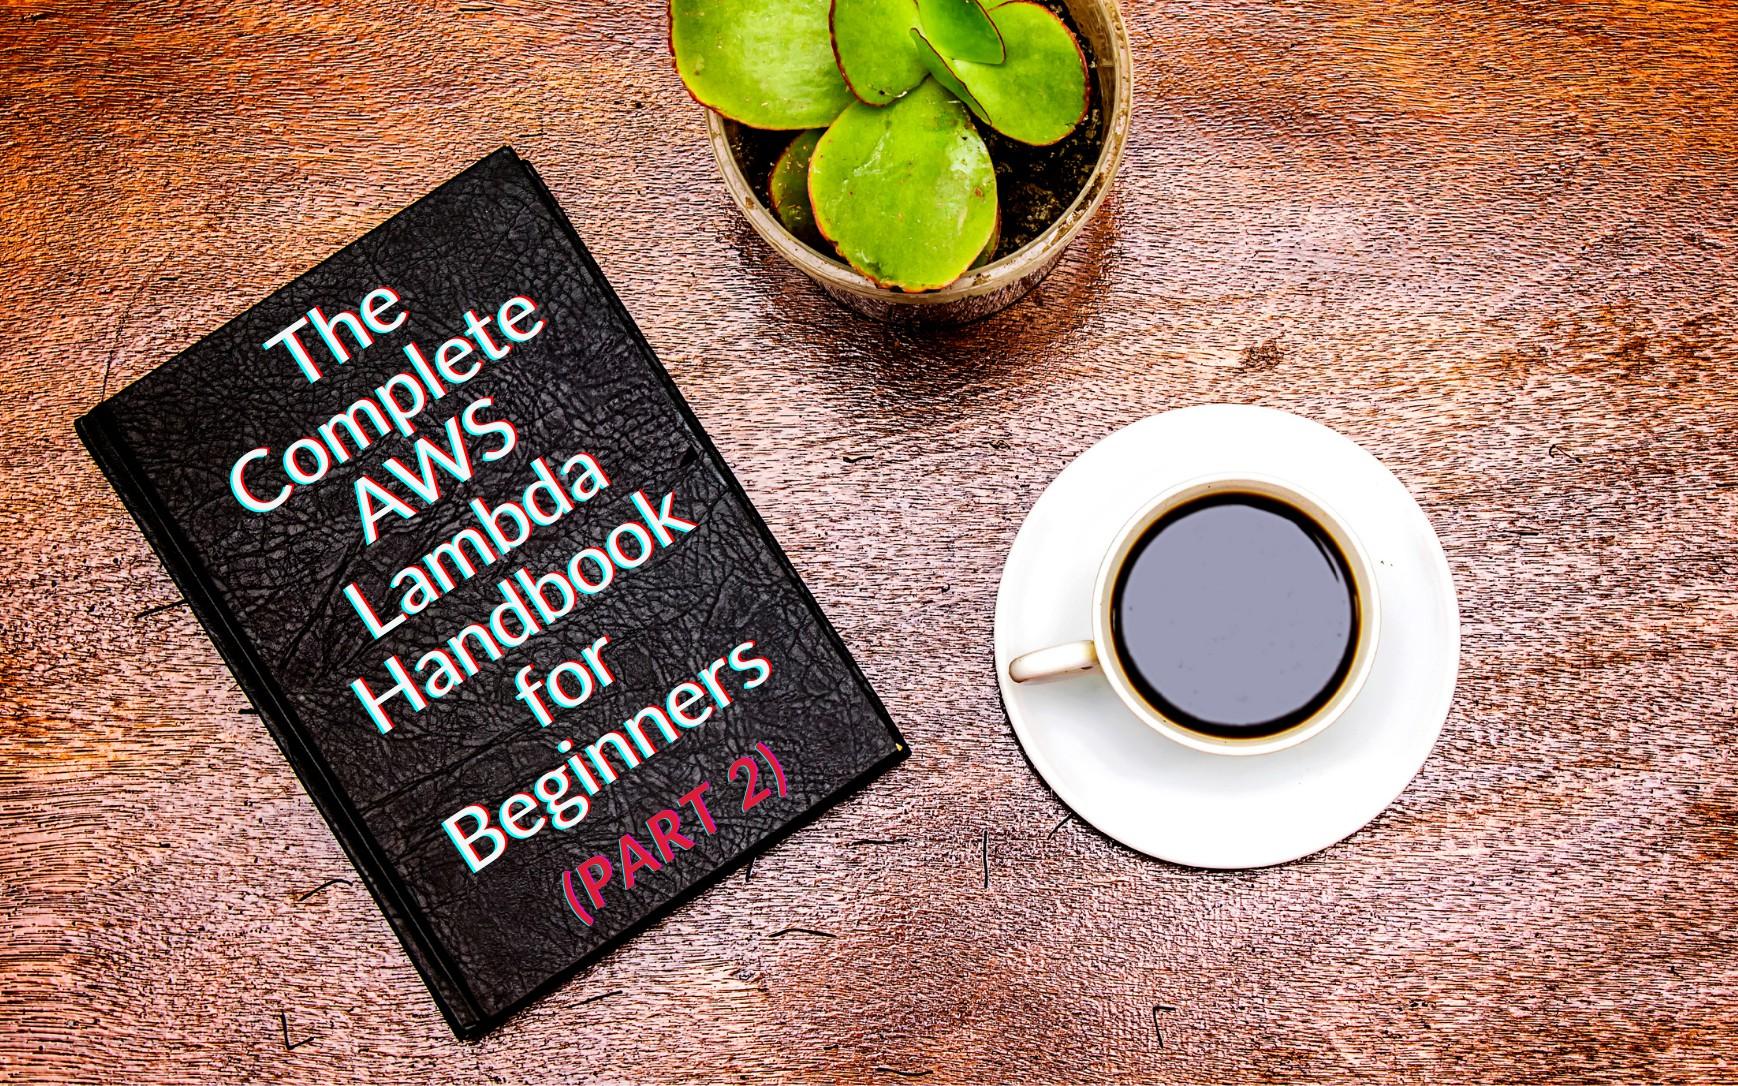 The Complete AWS Lambda Handbook for Beginners (Part 2)